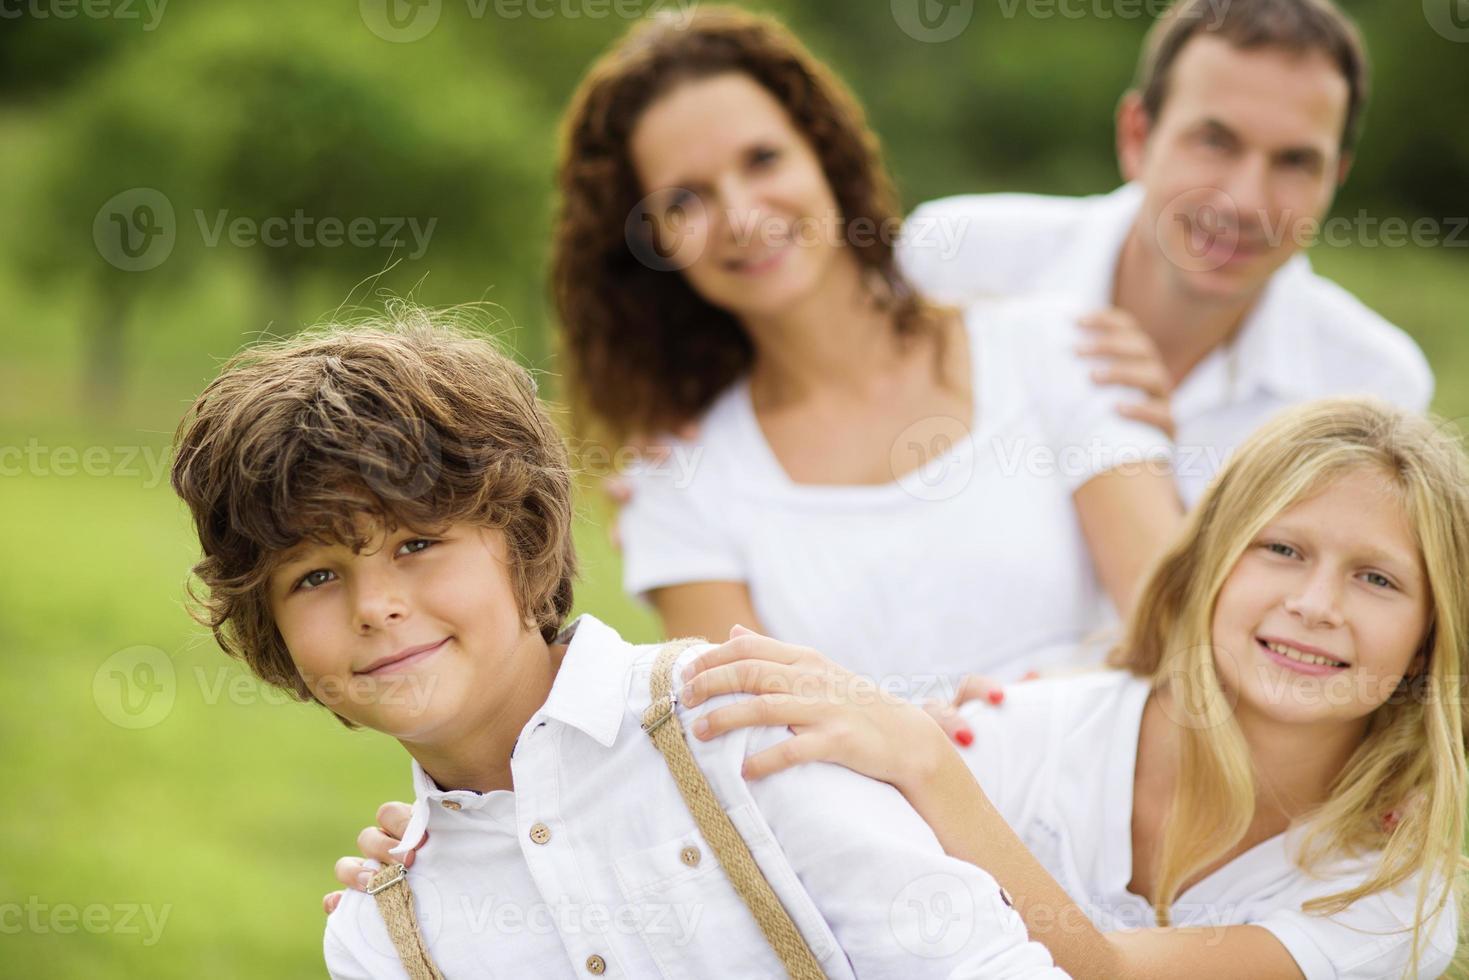 große Familie entspannt sich in grüner Natur foto